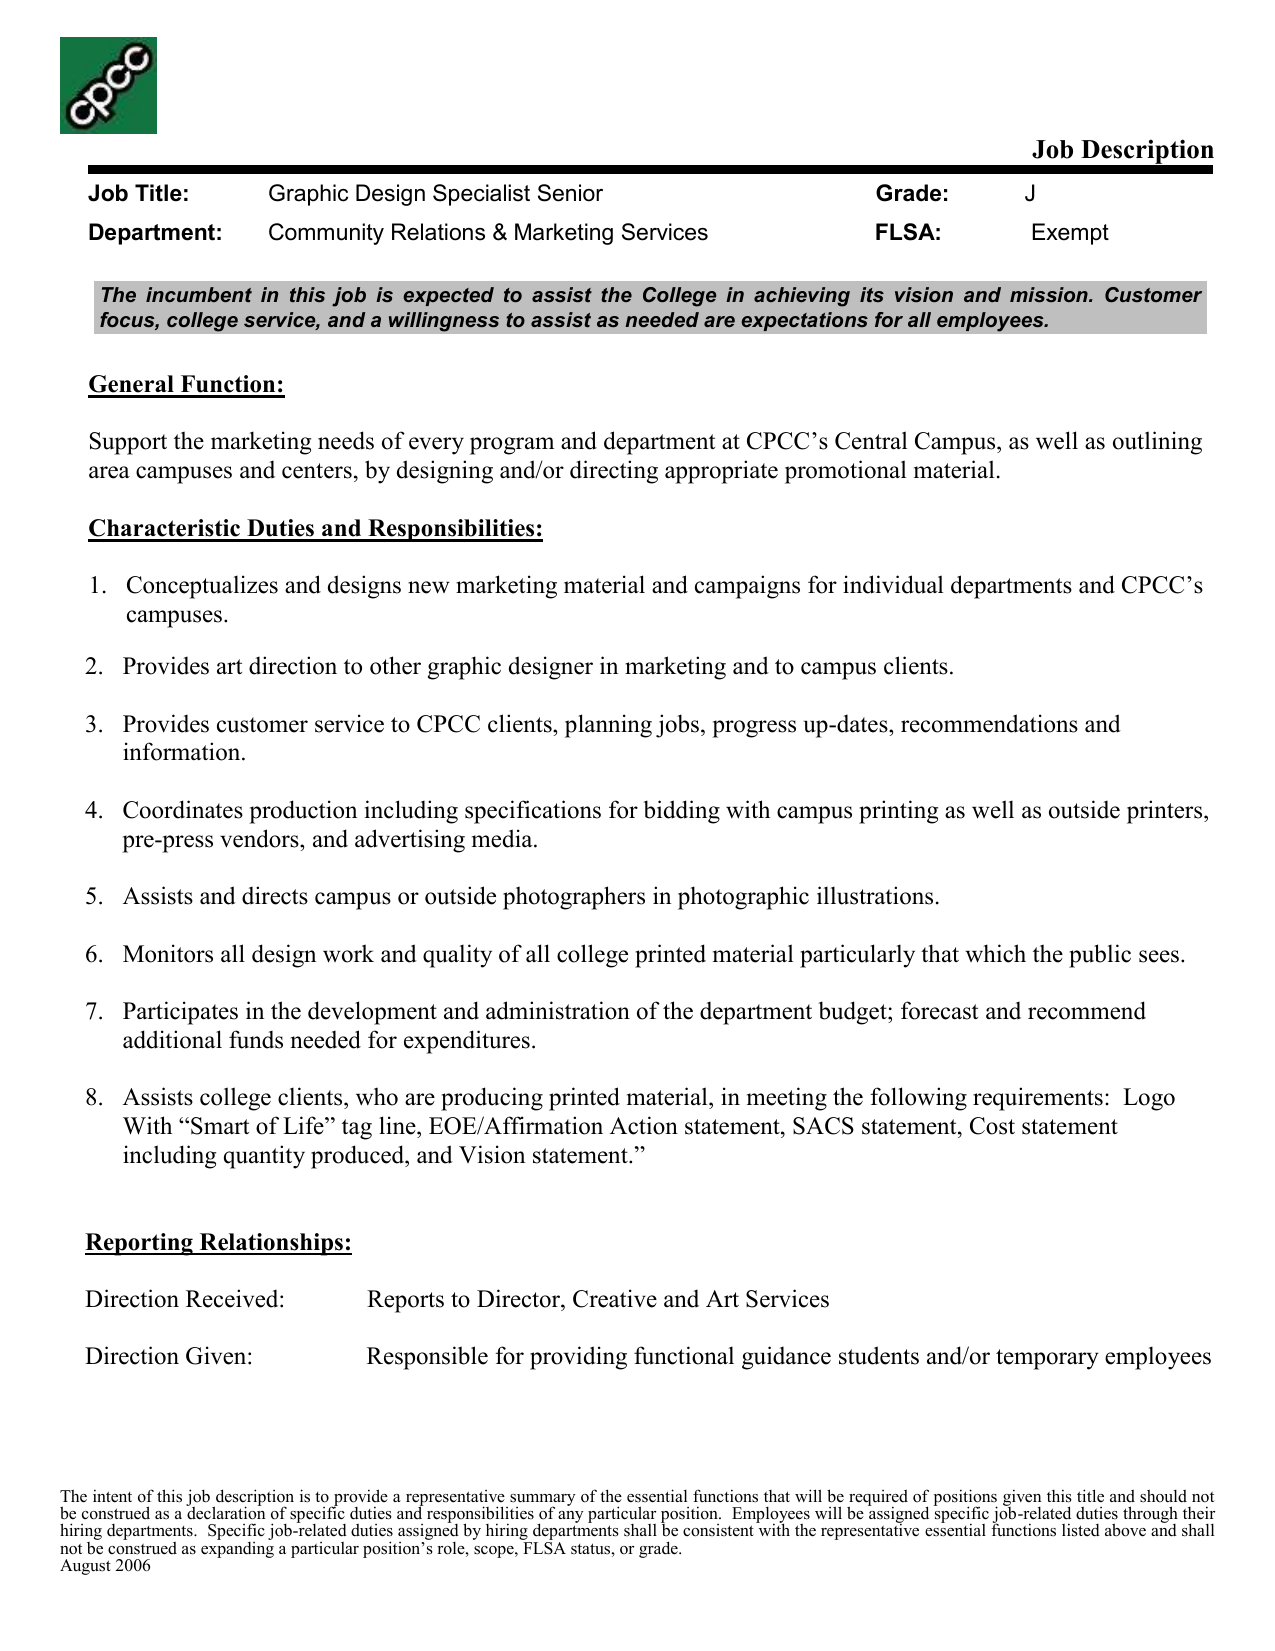 Graphic Design And Media Arts Jobs